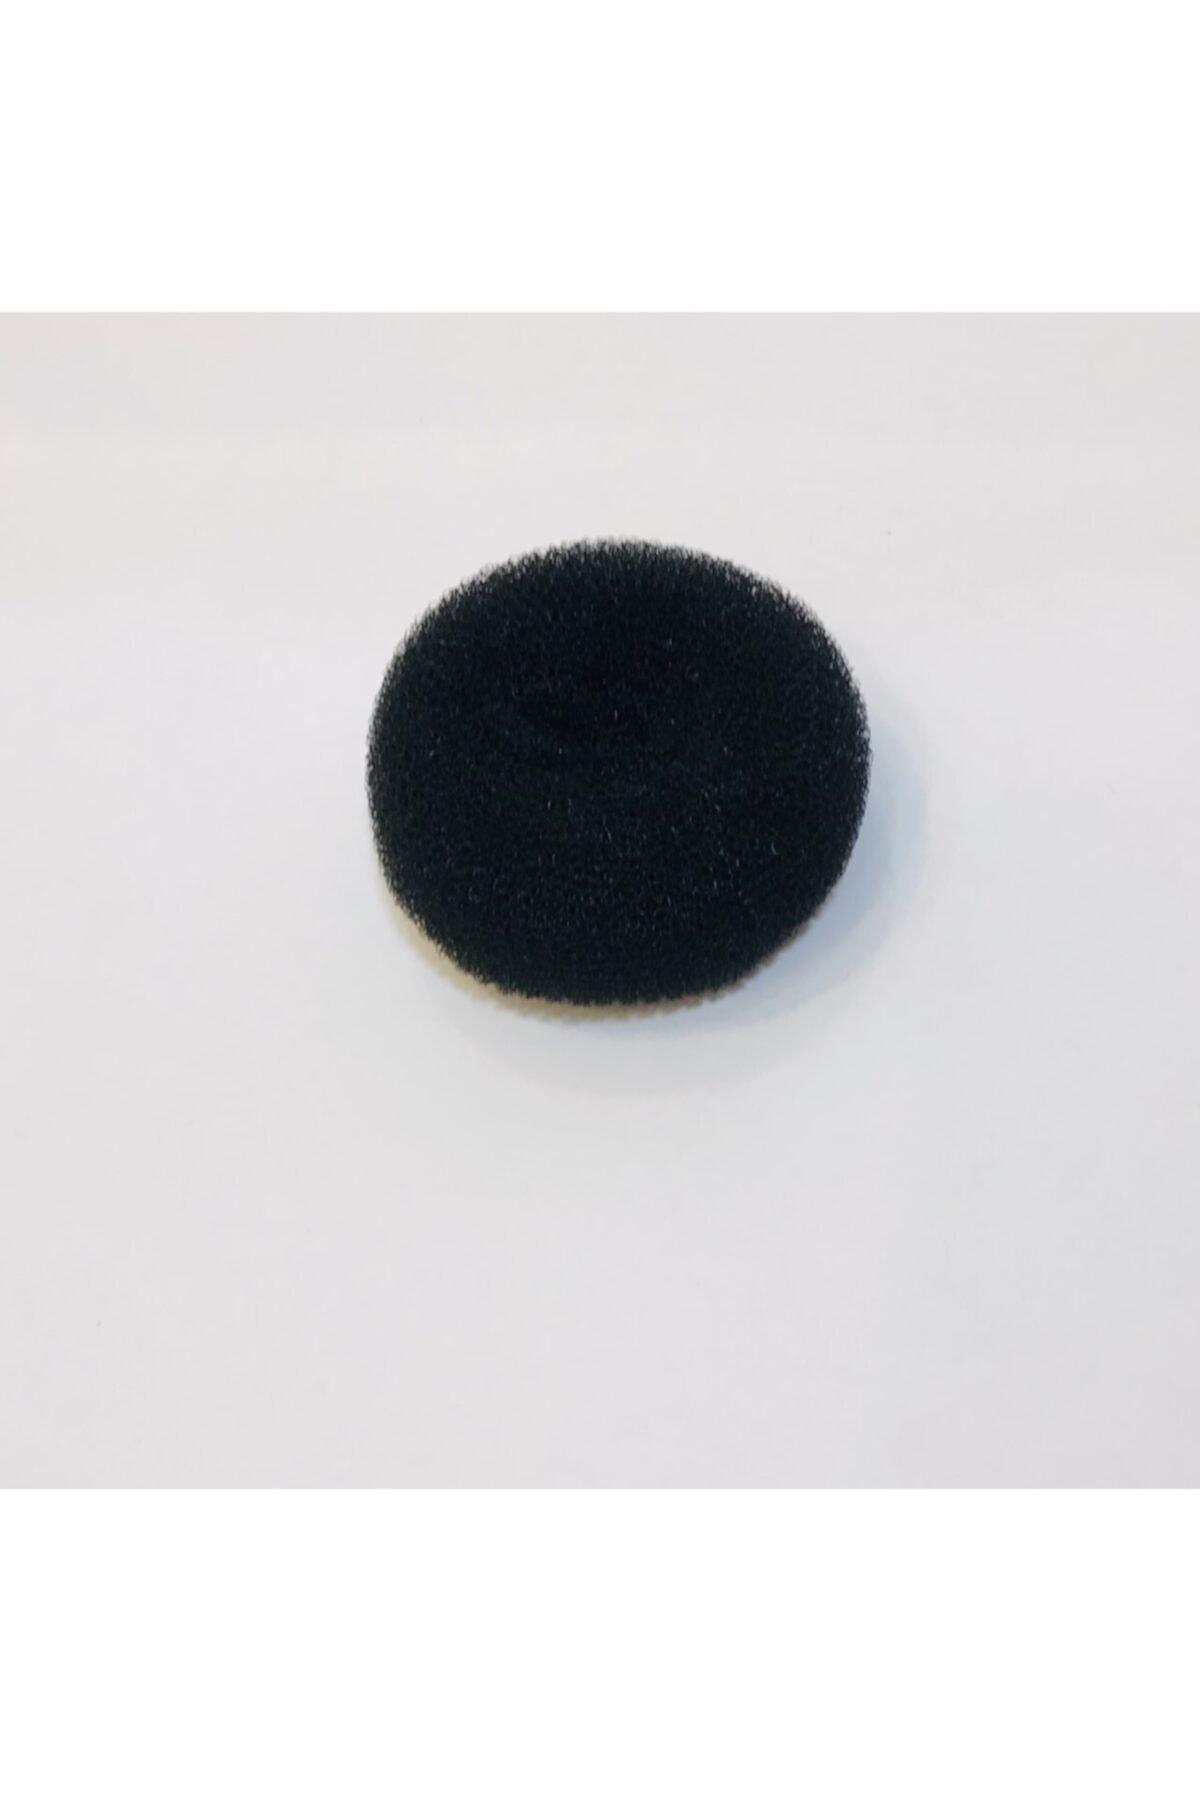 Mima Kadın Siyah Sünger Topuz Tokası 1